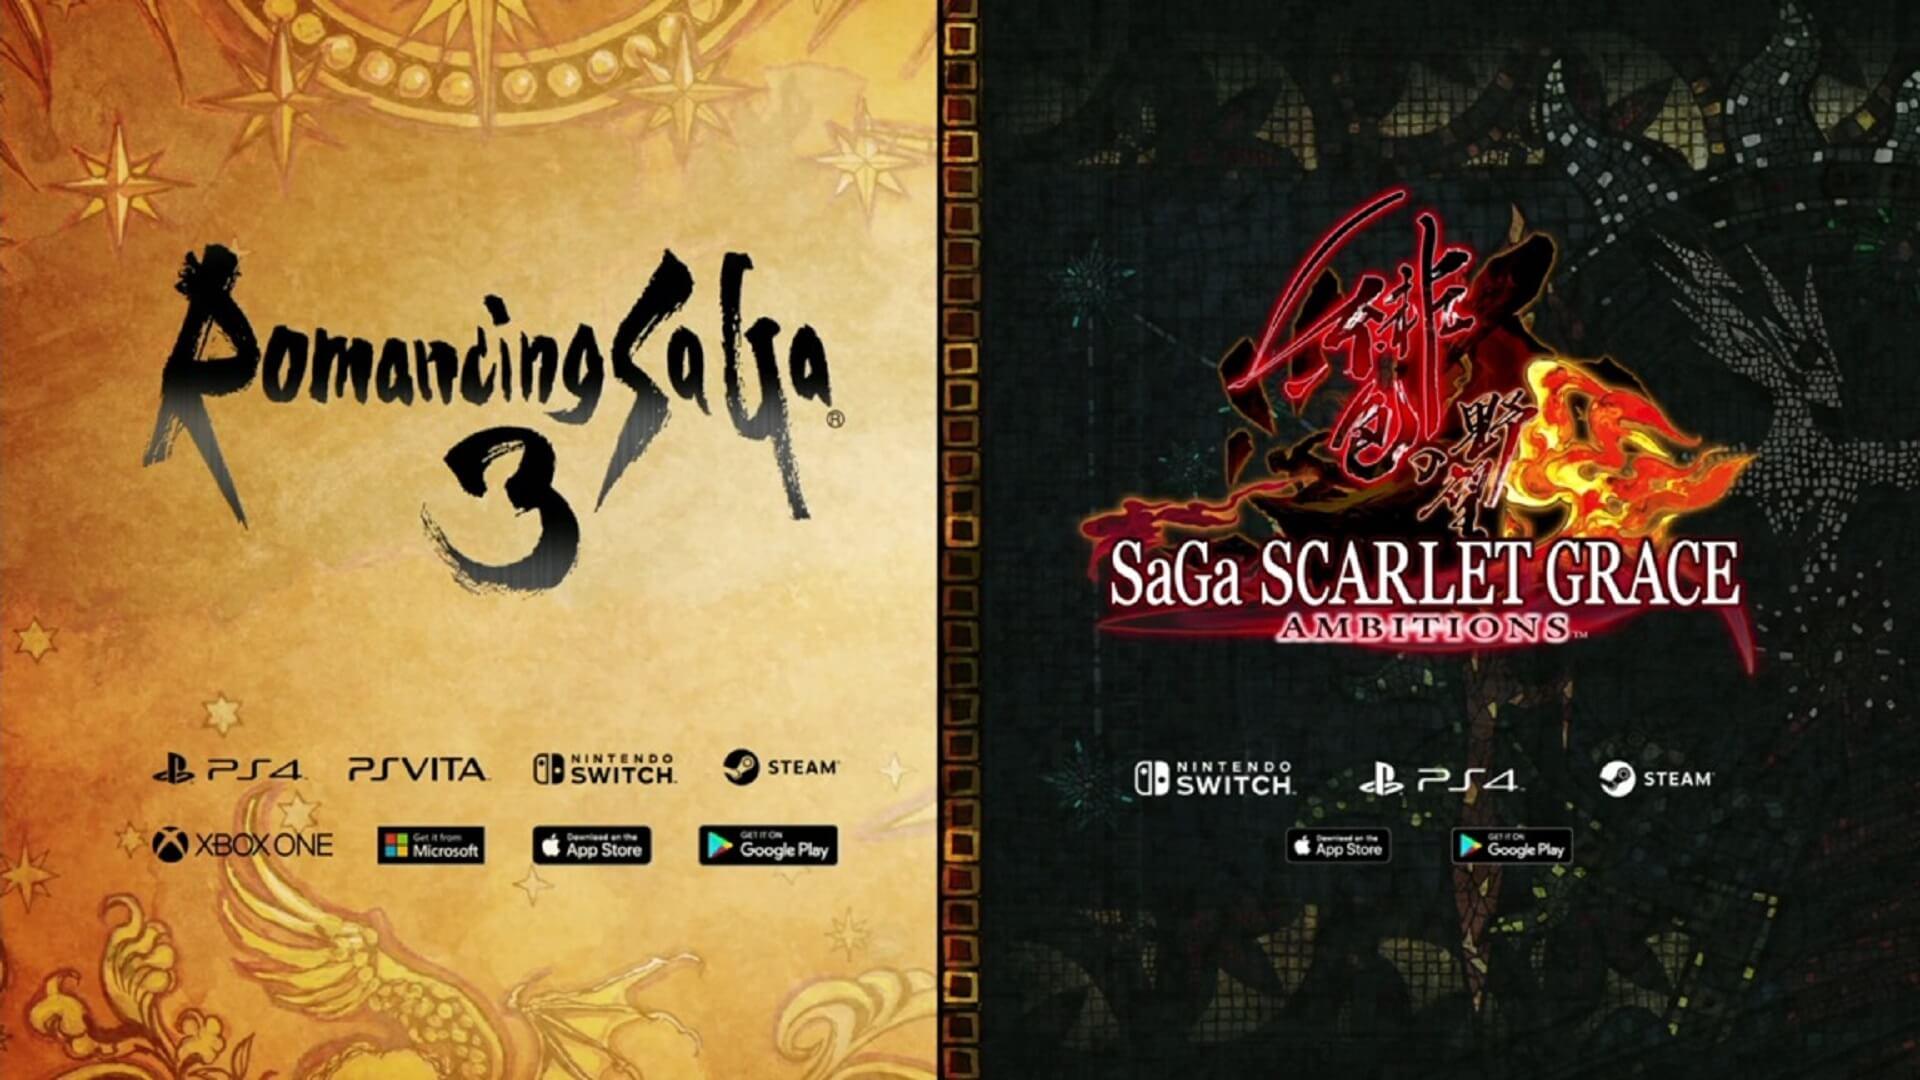 Romancing SaGa3 SaGa Scarlet Grace Ambitions